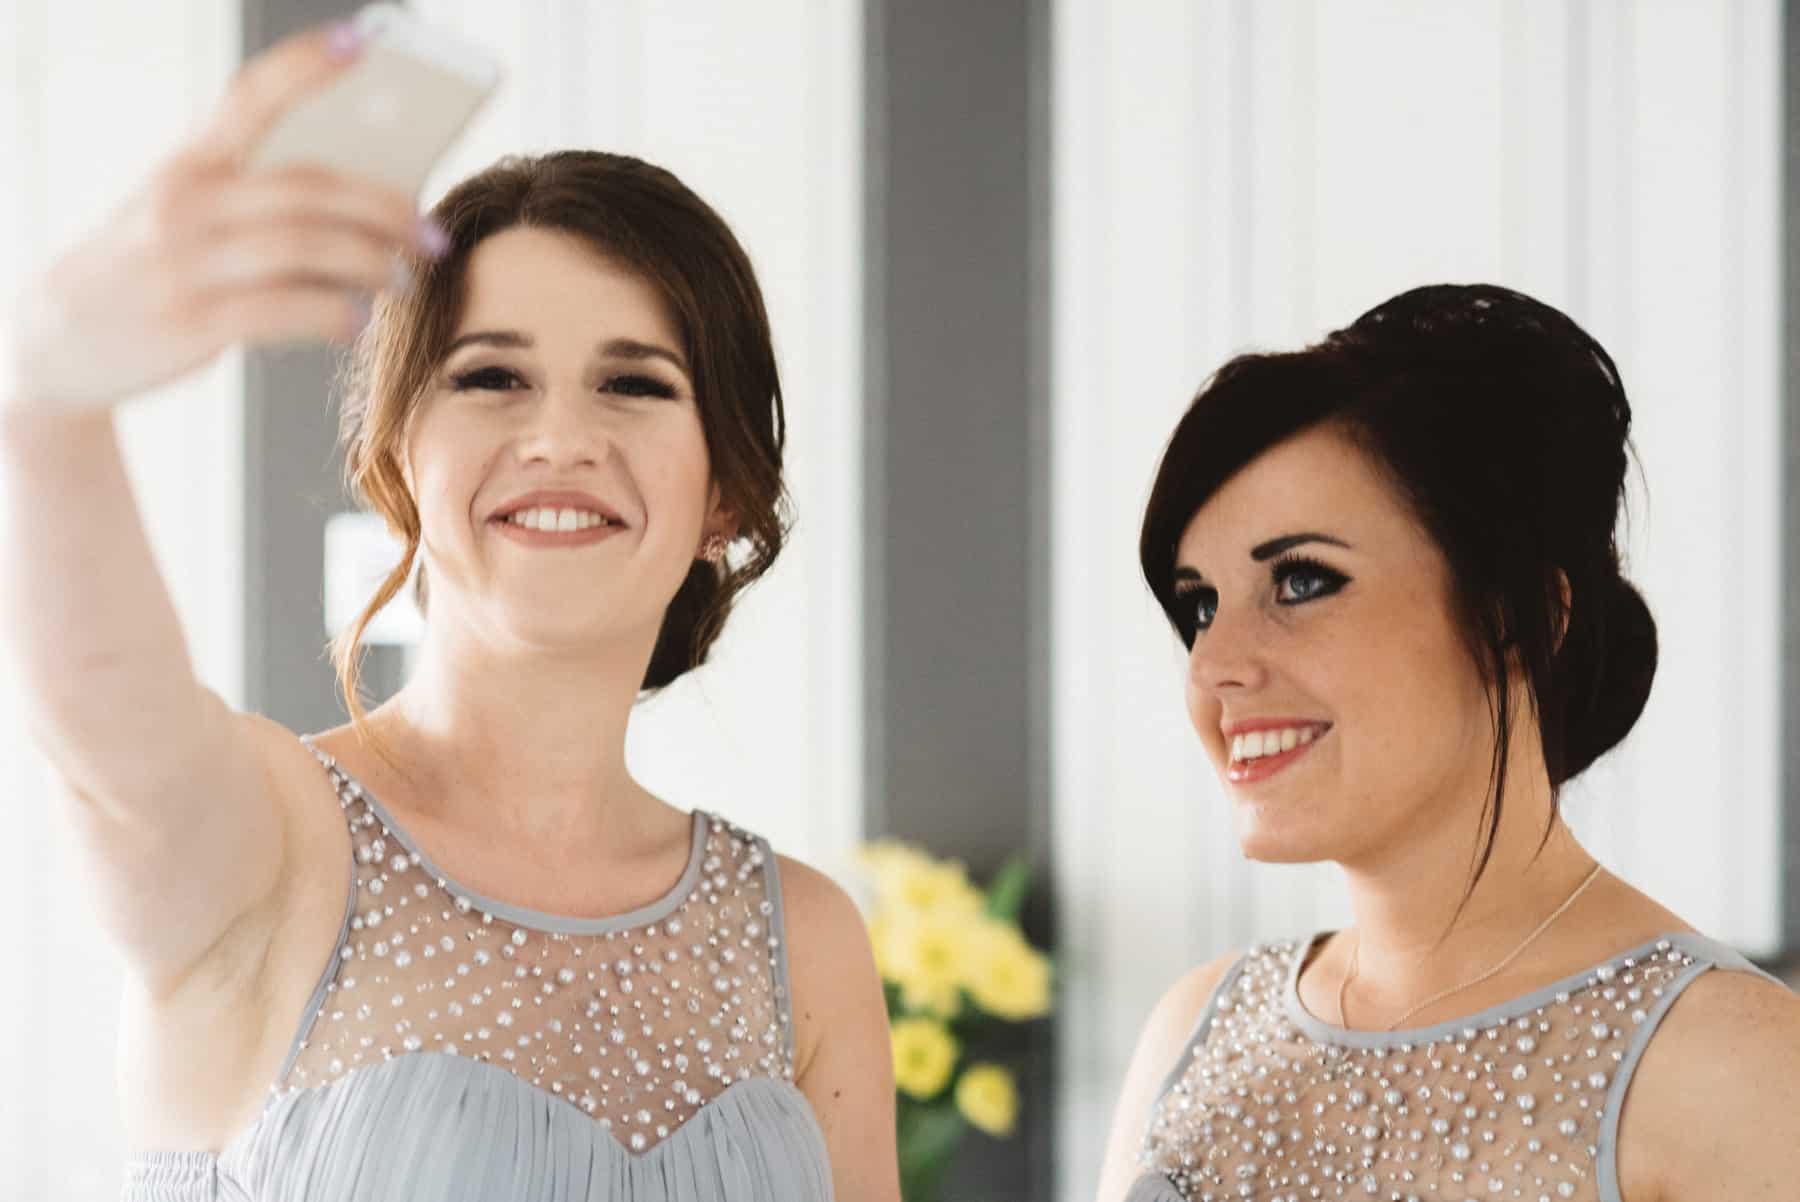 wedding photography bridesmaids selfie (1 of 1)